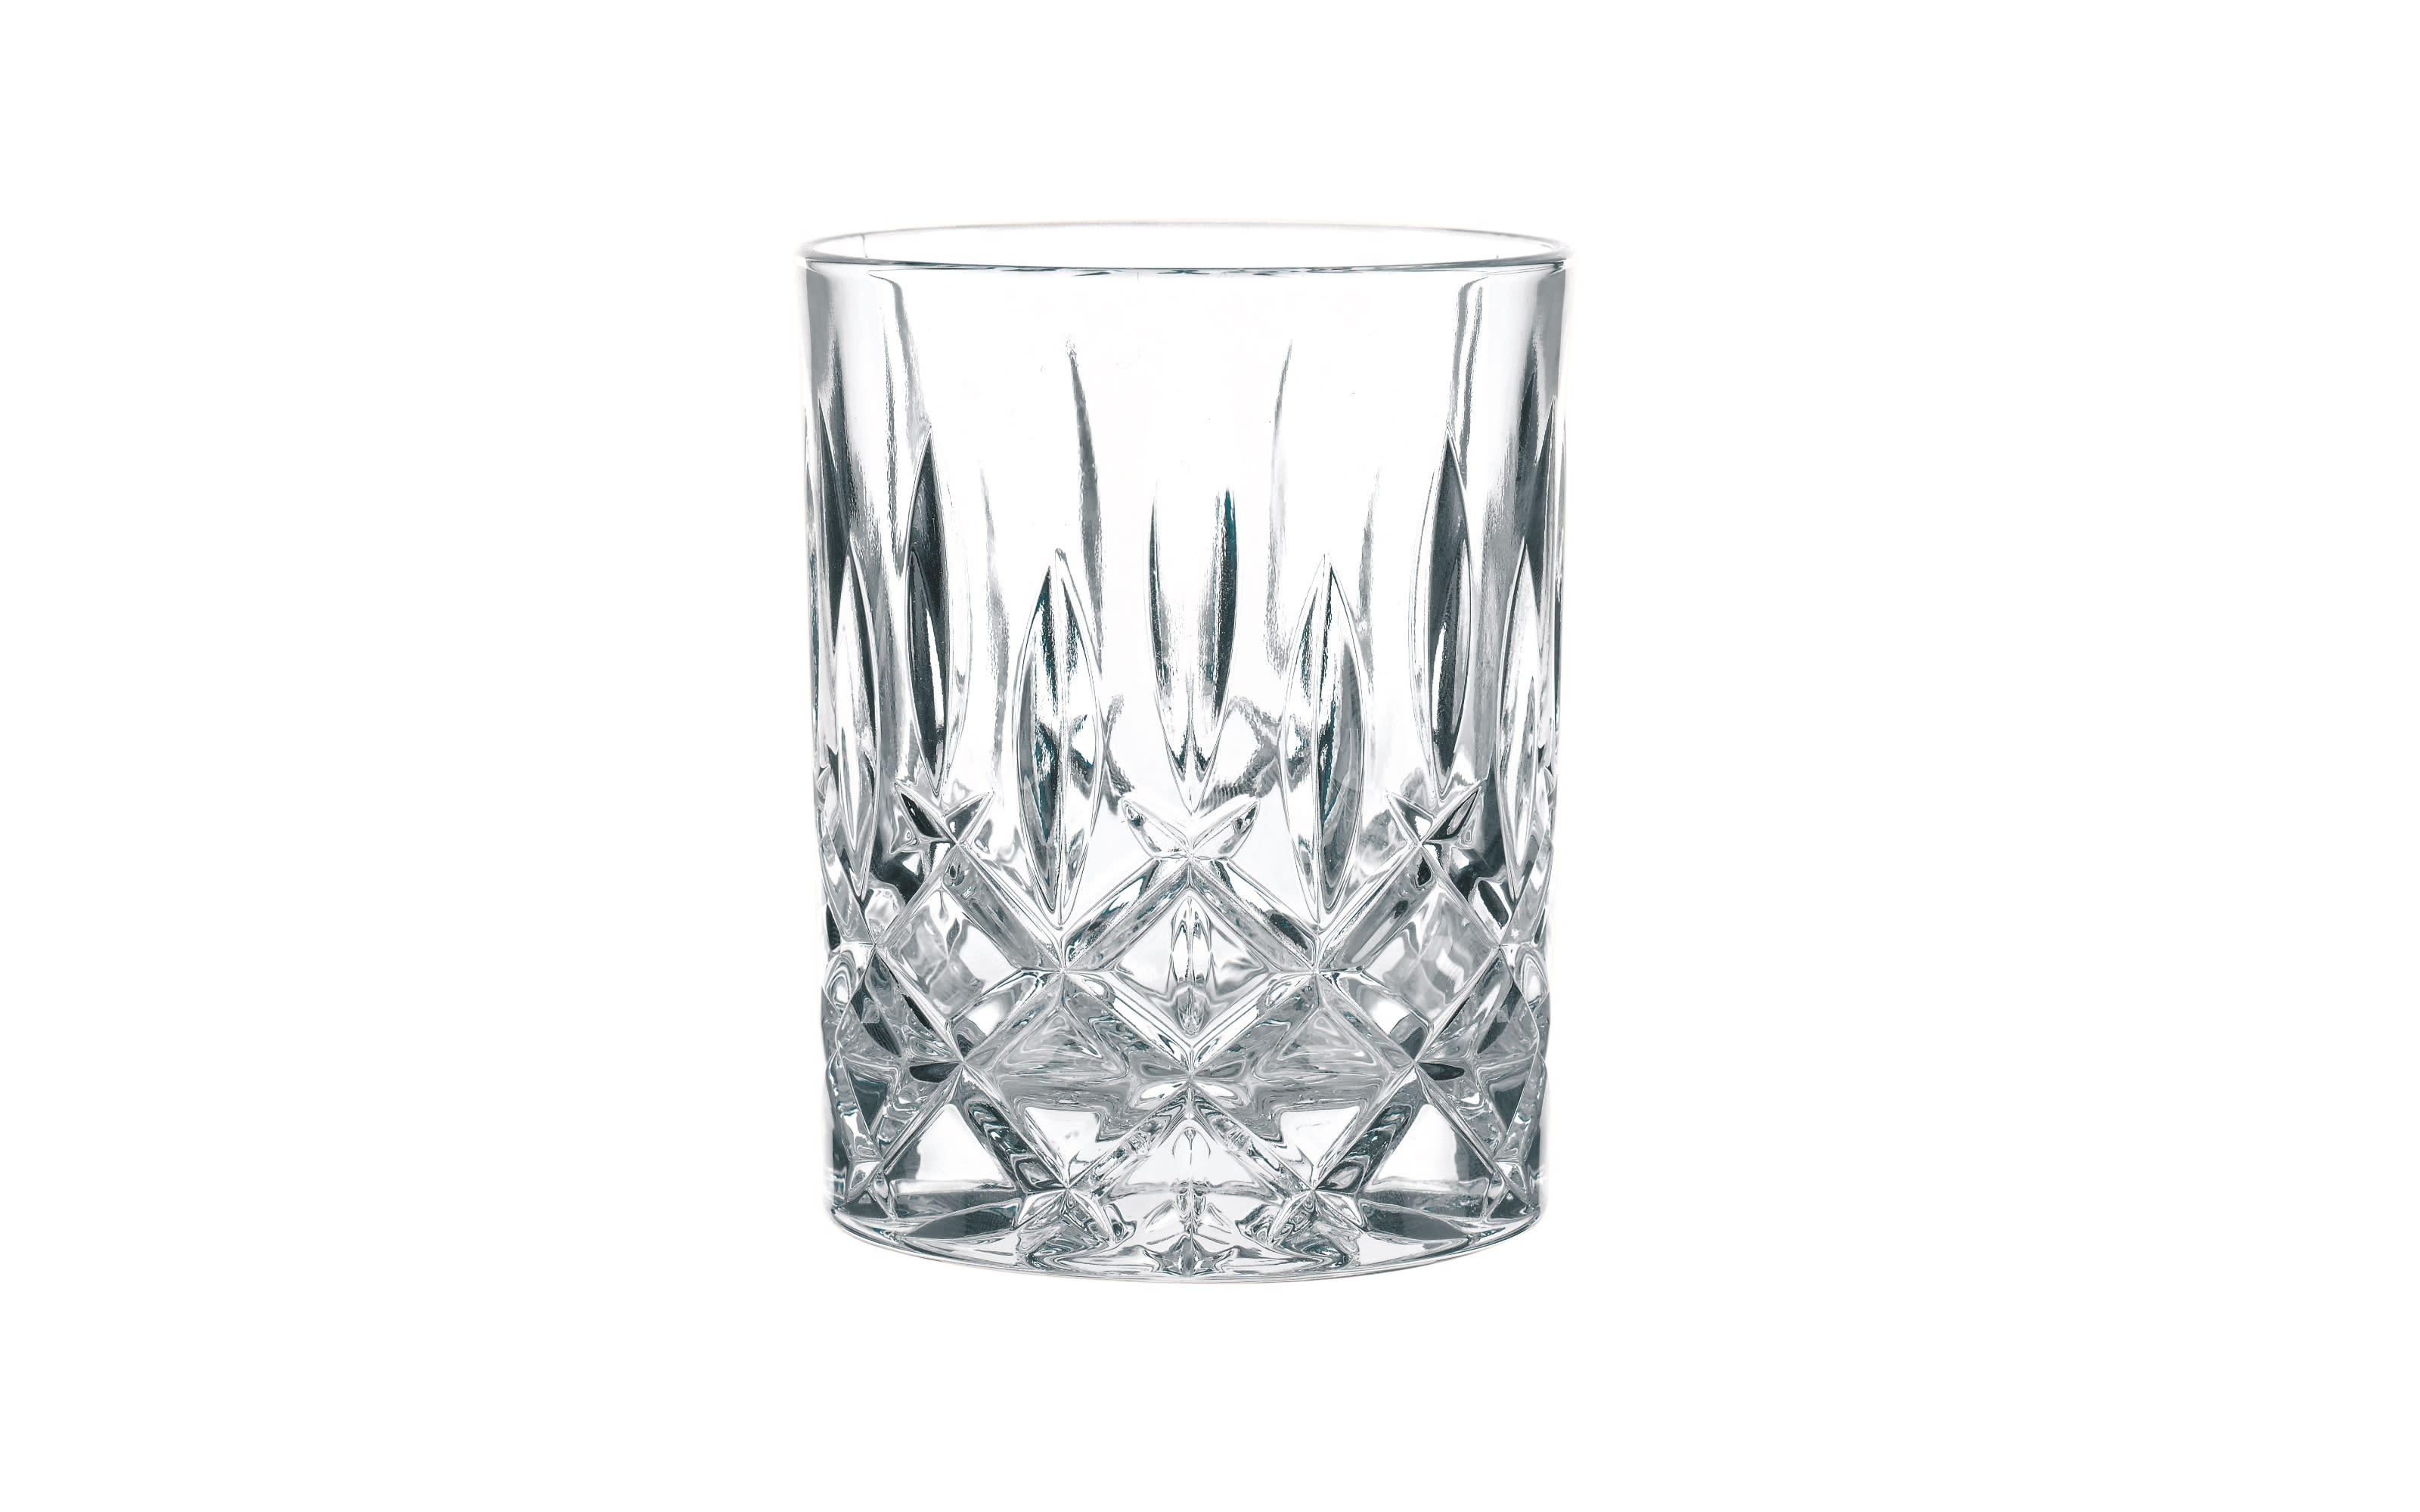 Whiskybecher Noblesse in klar, 4-teilig